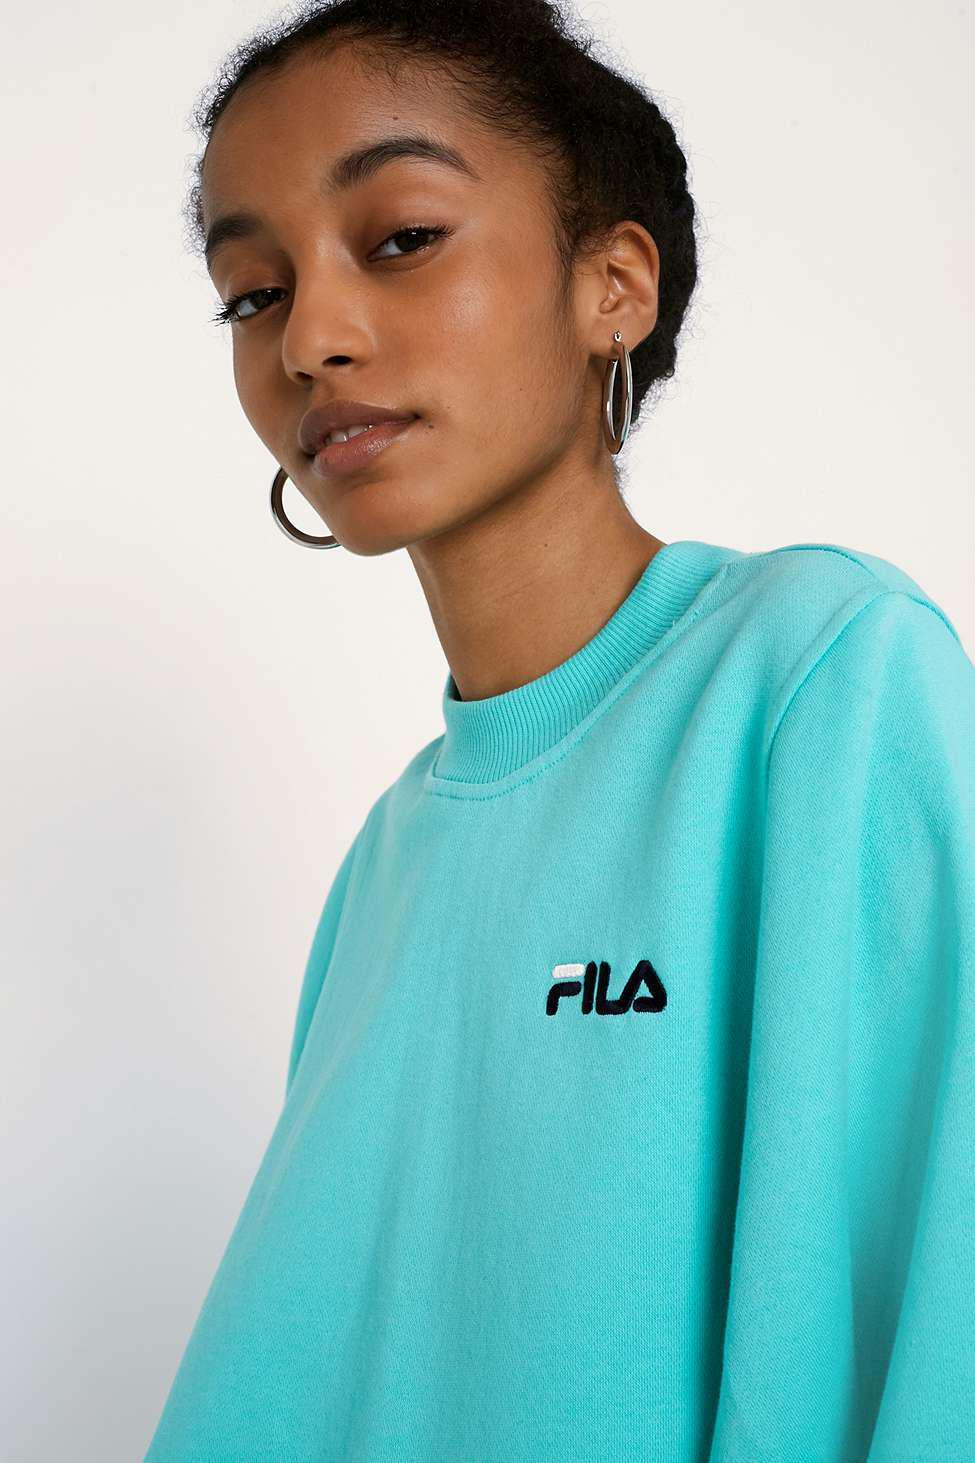 7d15c3da32d Fila Summer Teal Sweatshirt - Womens M in Green - Lyst